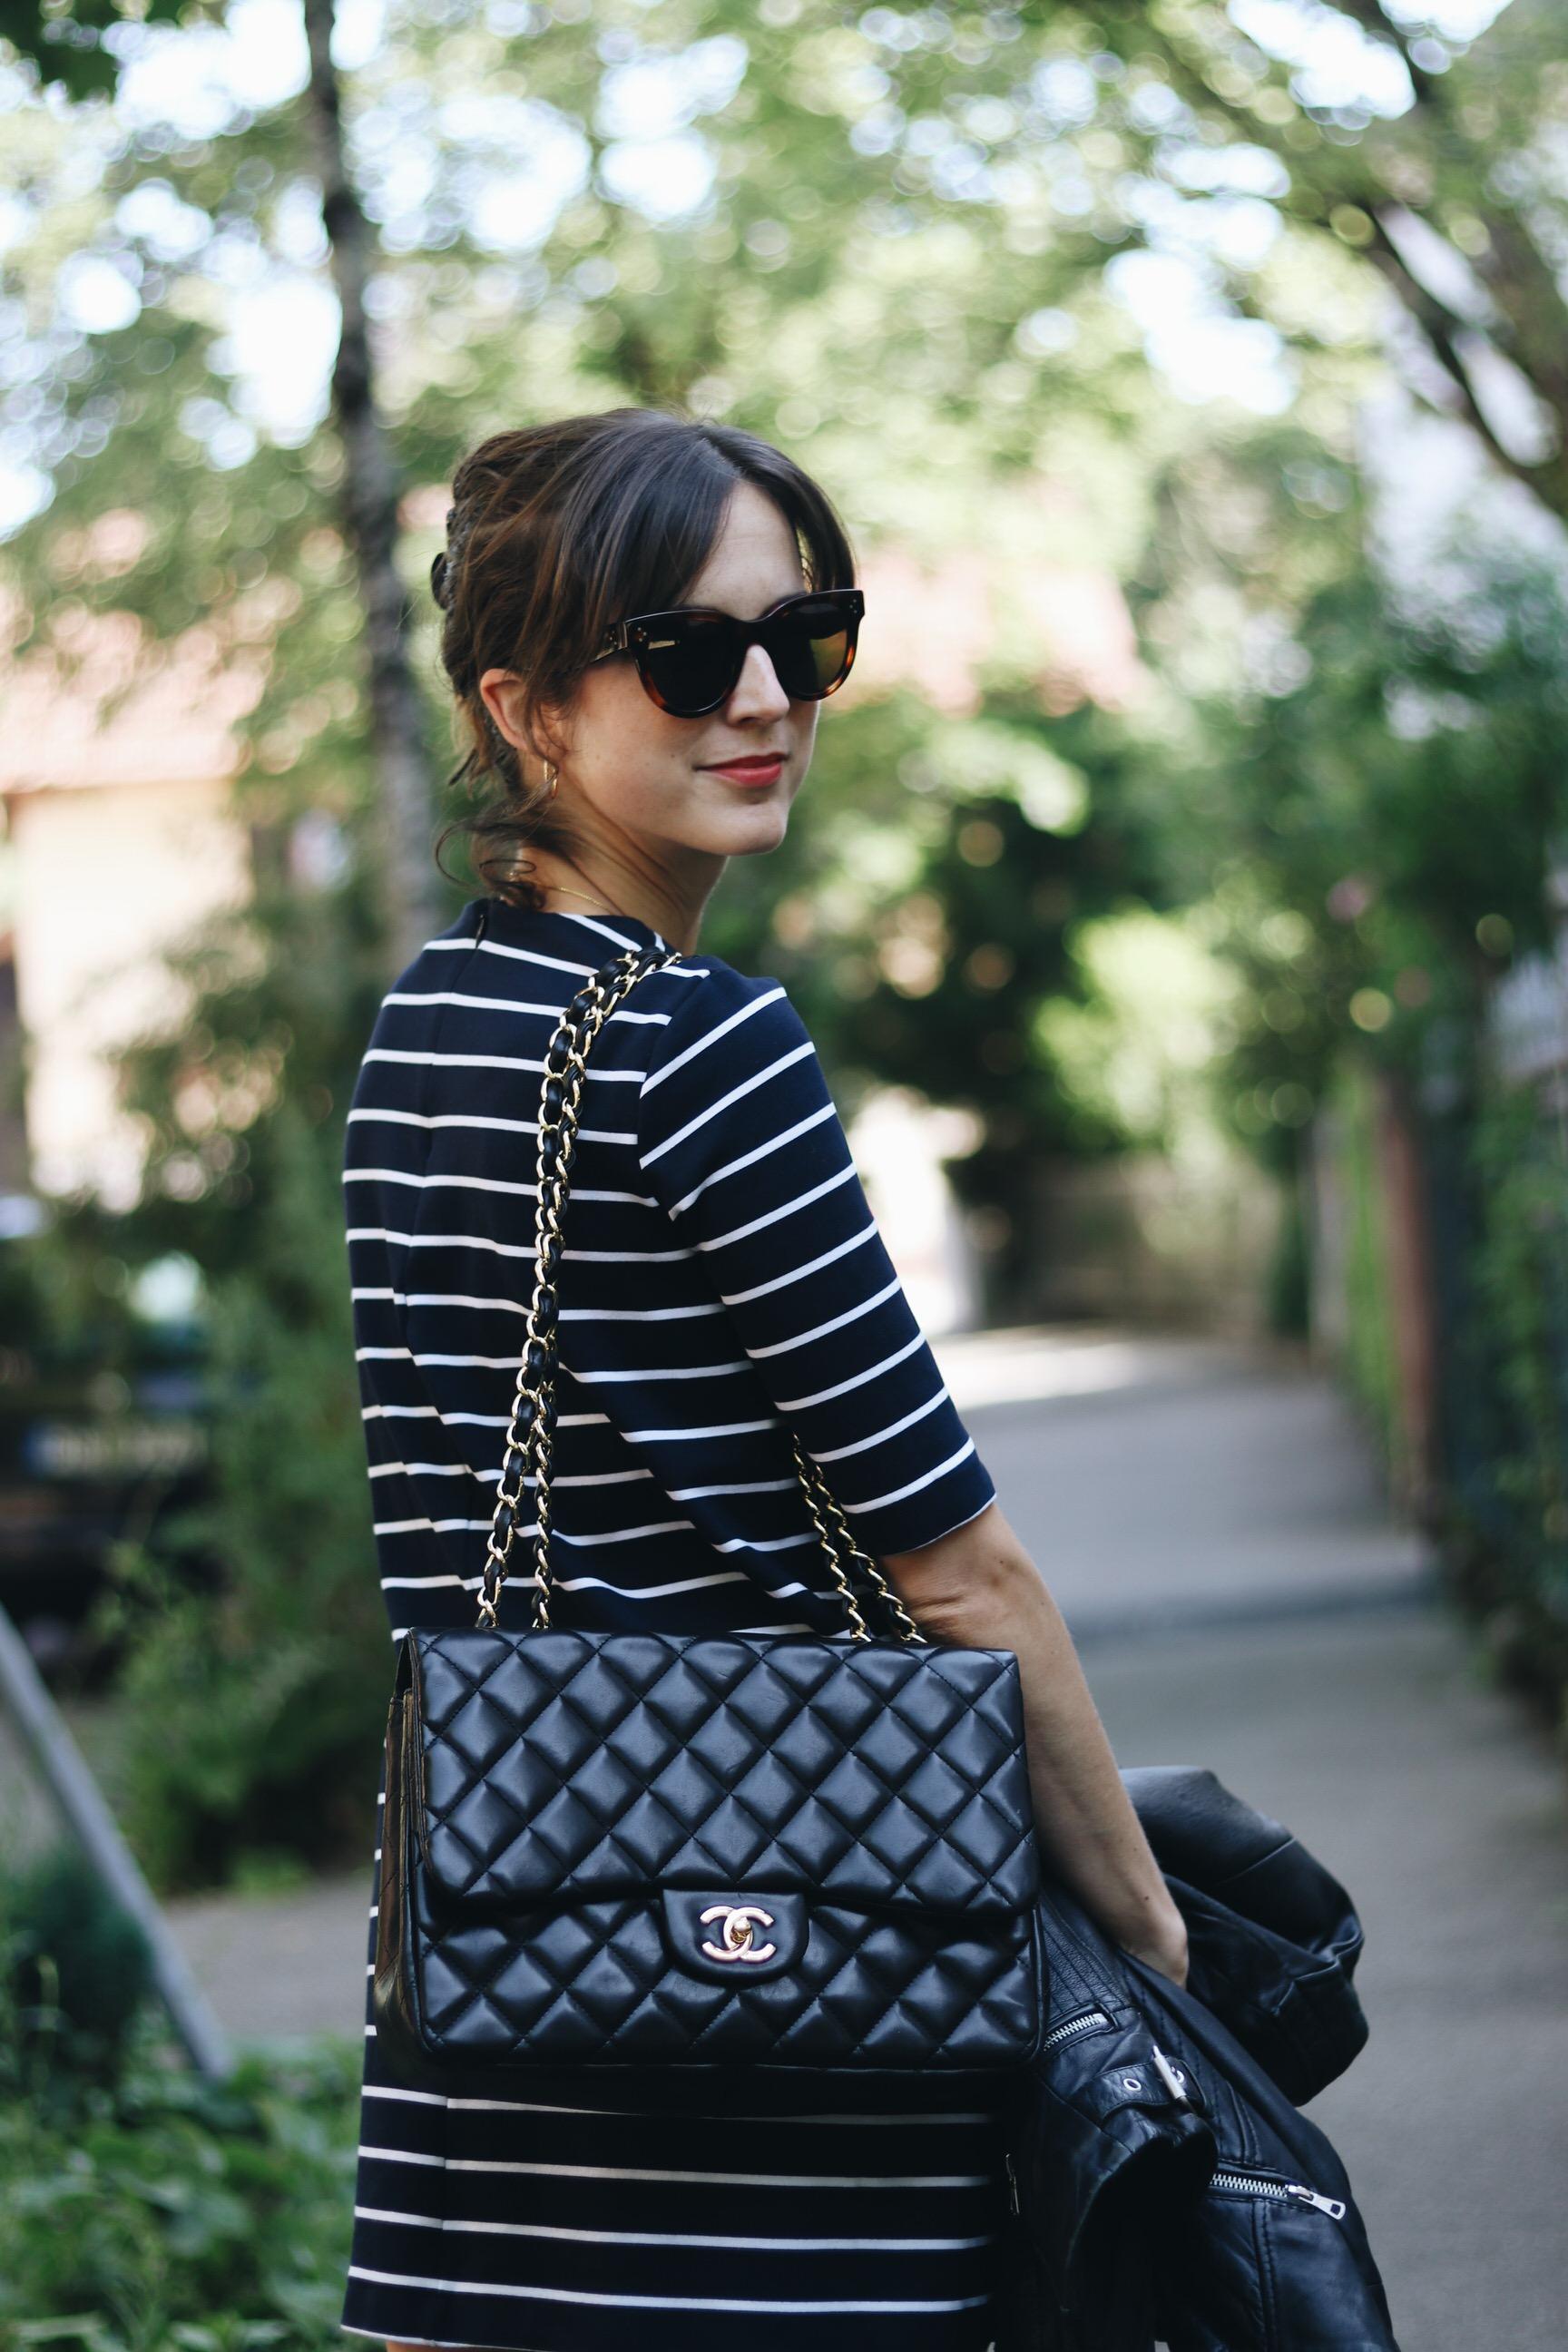 Modebloggerin Chanel Tasche Modell klassisch Celine Sonnenbrille Modebloggerin Neele